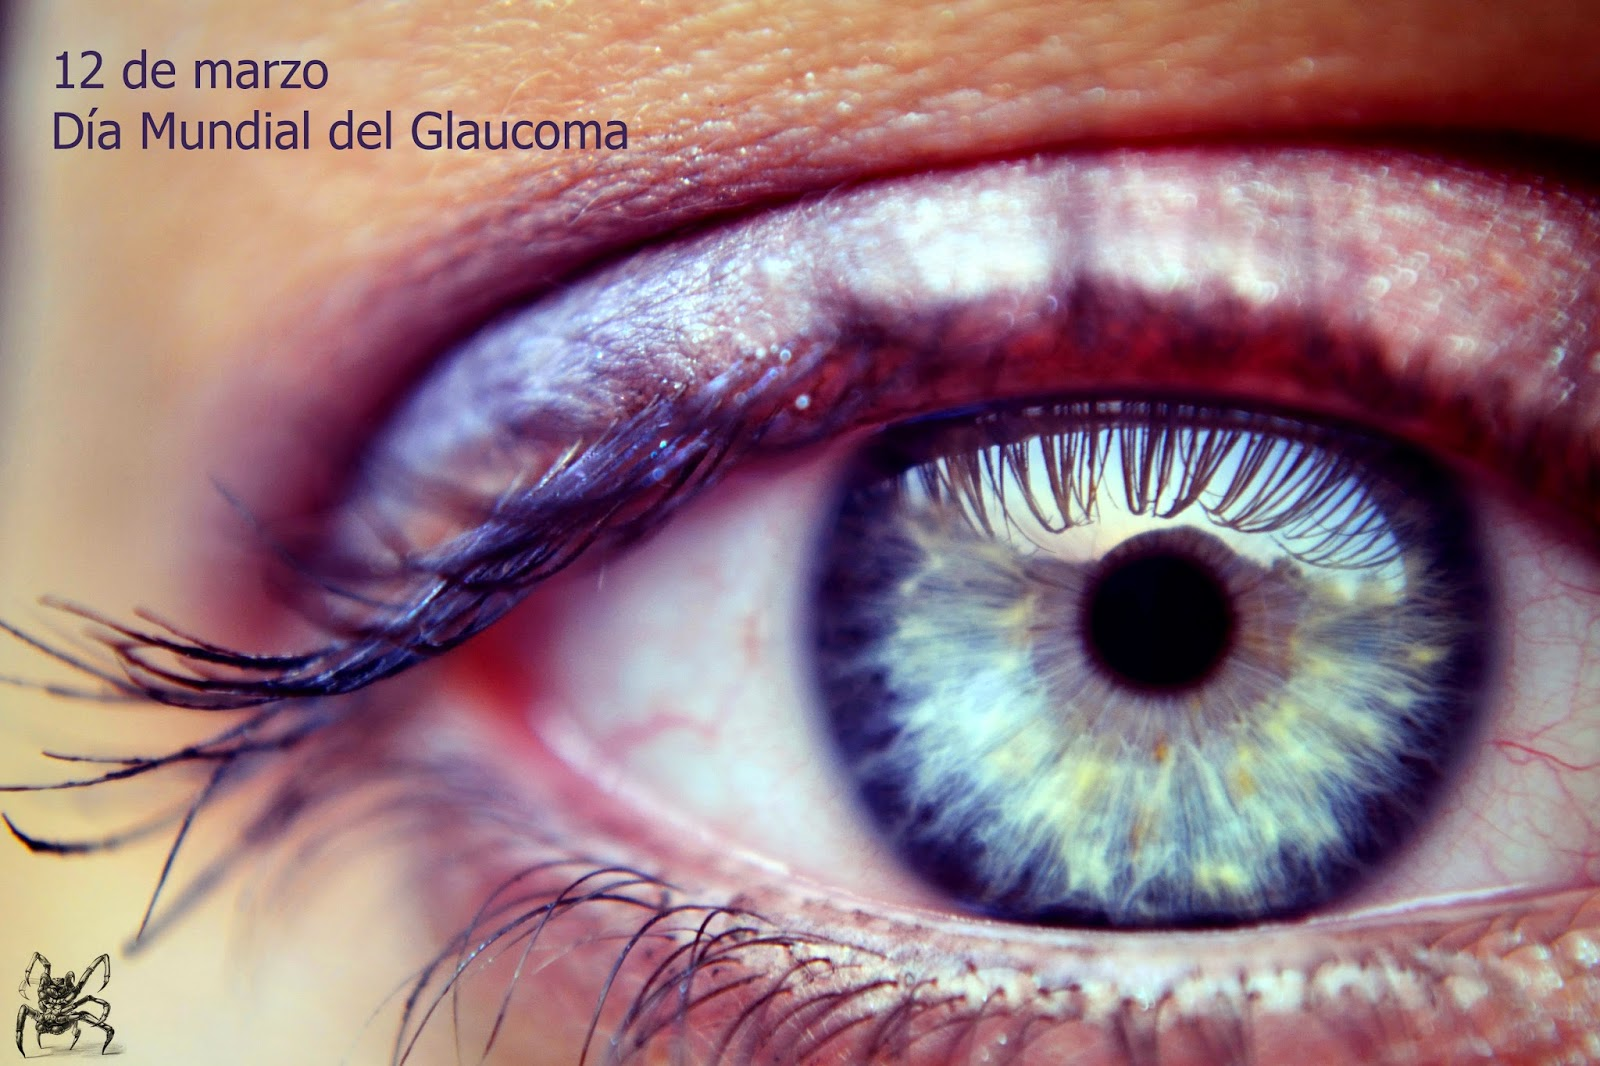 12 de marzo, día mundial del gloucoma